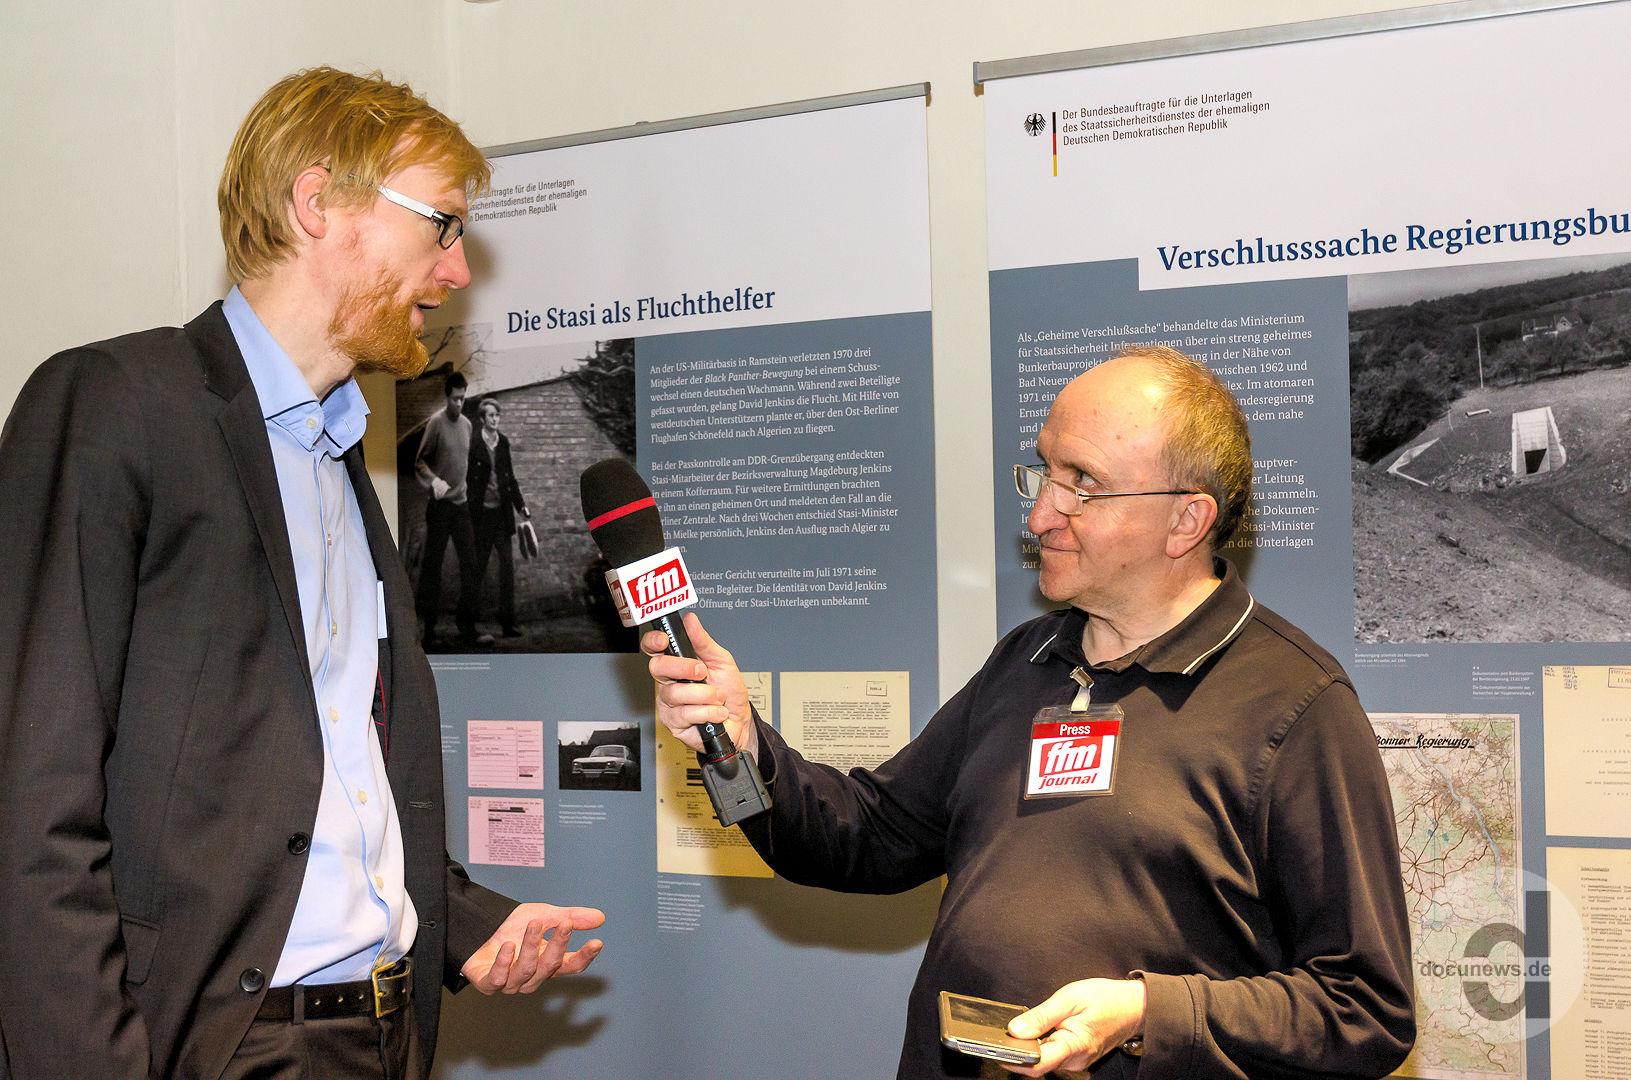 Zeithistoriker Dr. Henrik Bispinck im Interview in Mainz © dokubild.de / Friedhelm Herr